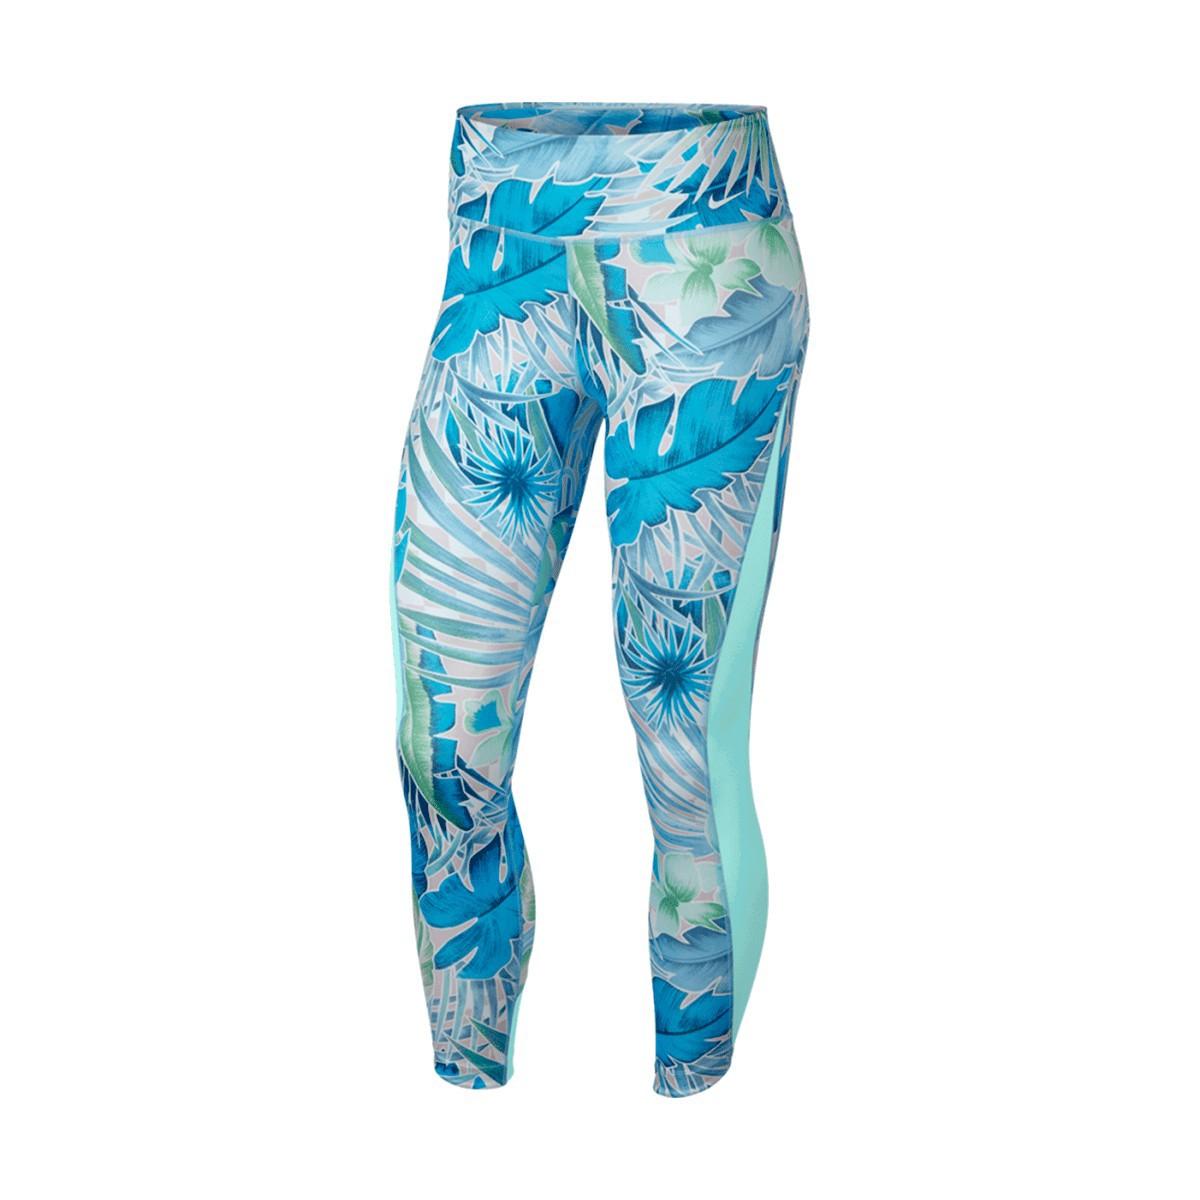 Calça Nike Legging Hyperflora Feminina Azul